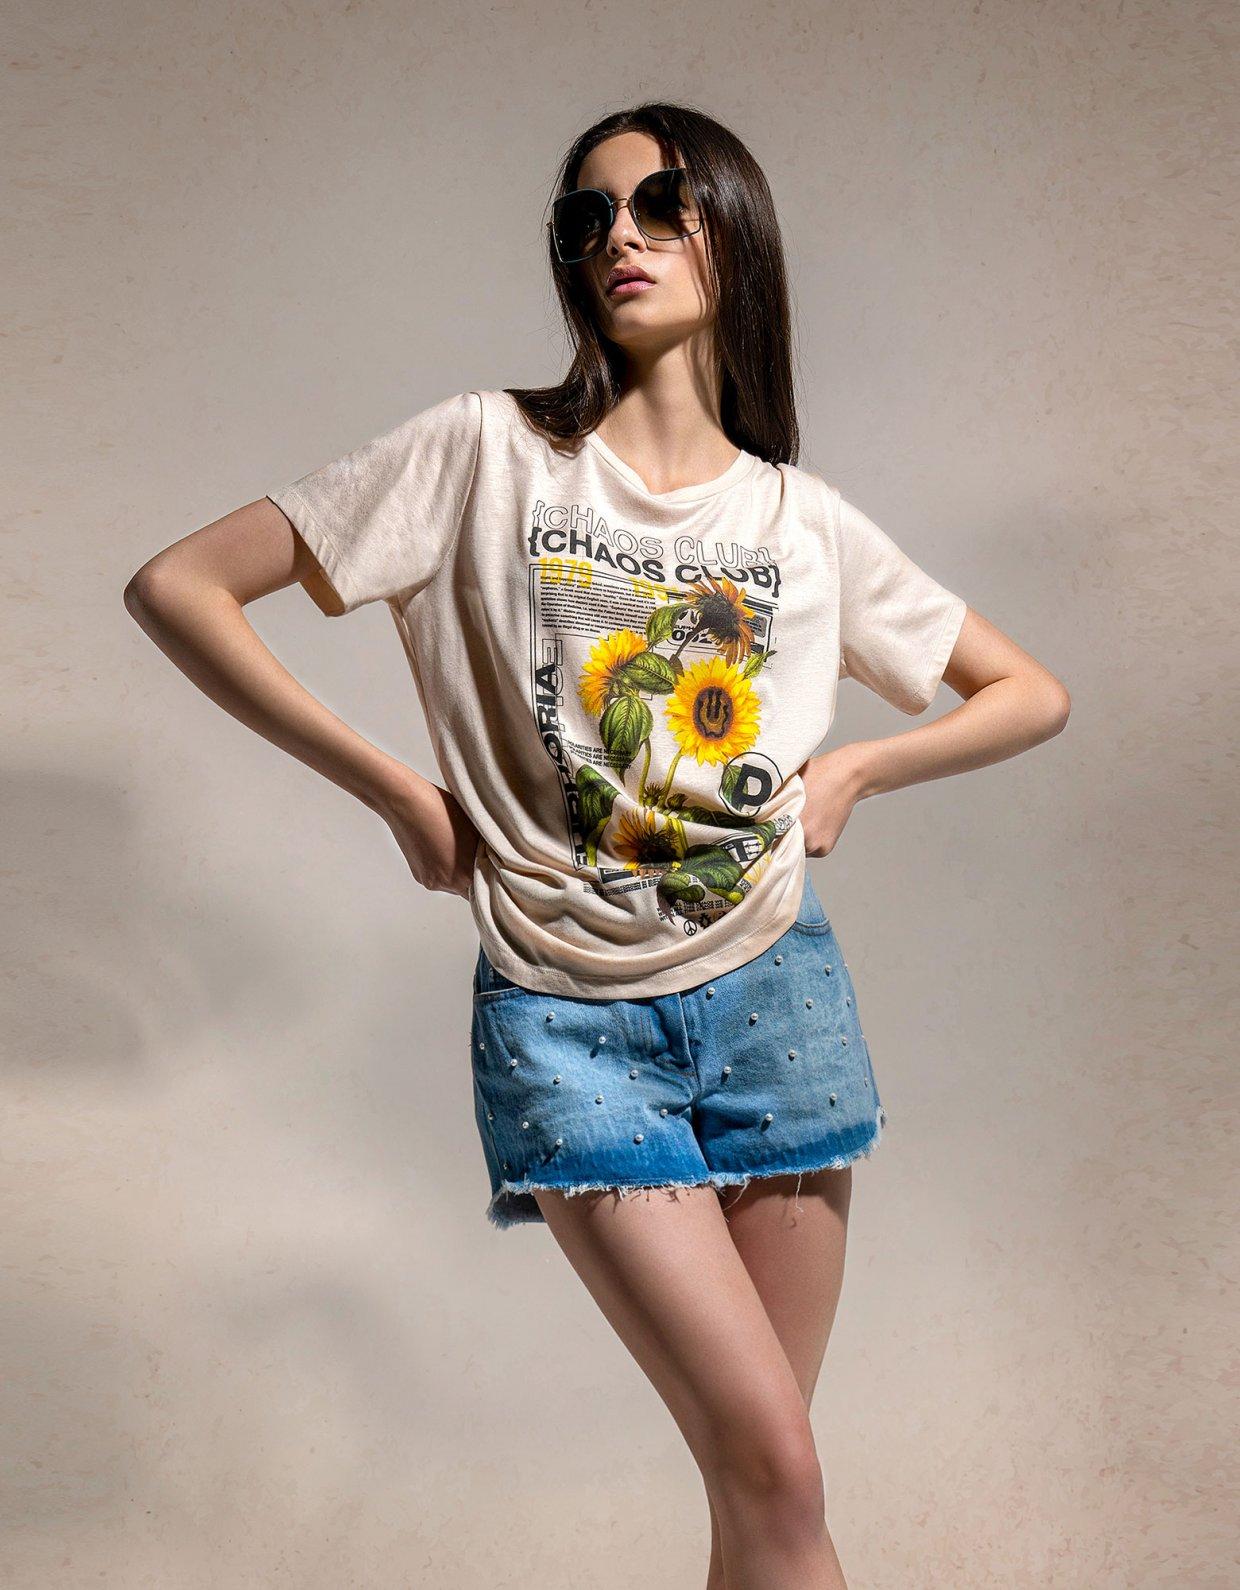 Peace & Chaos Chaos club t-shirt